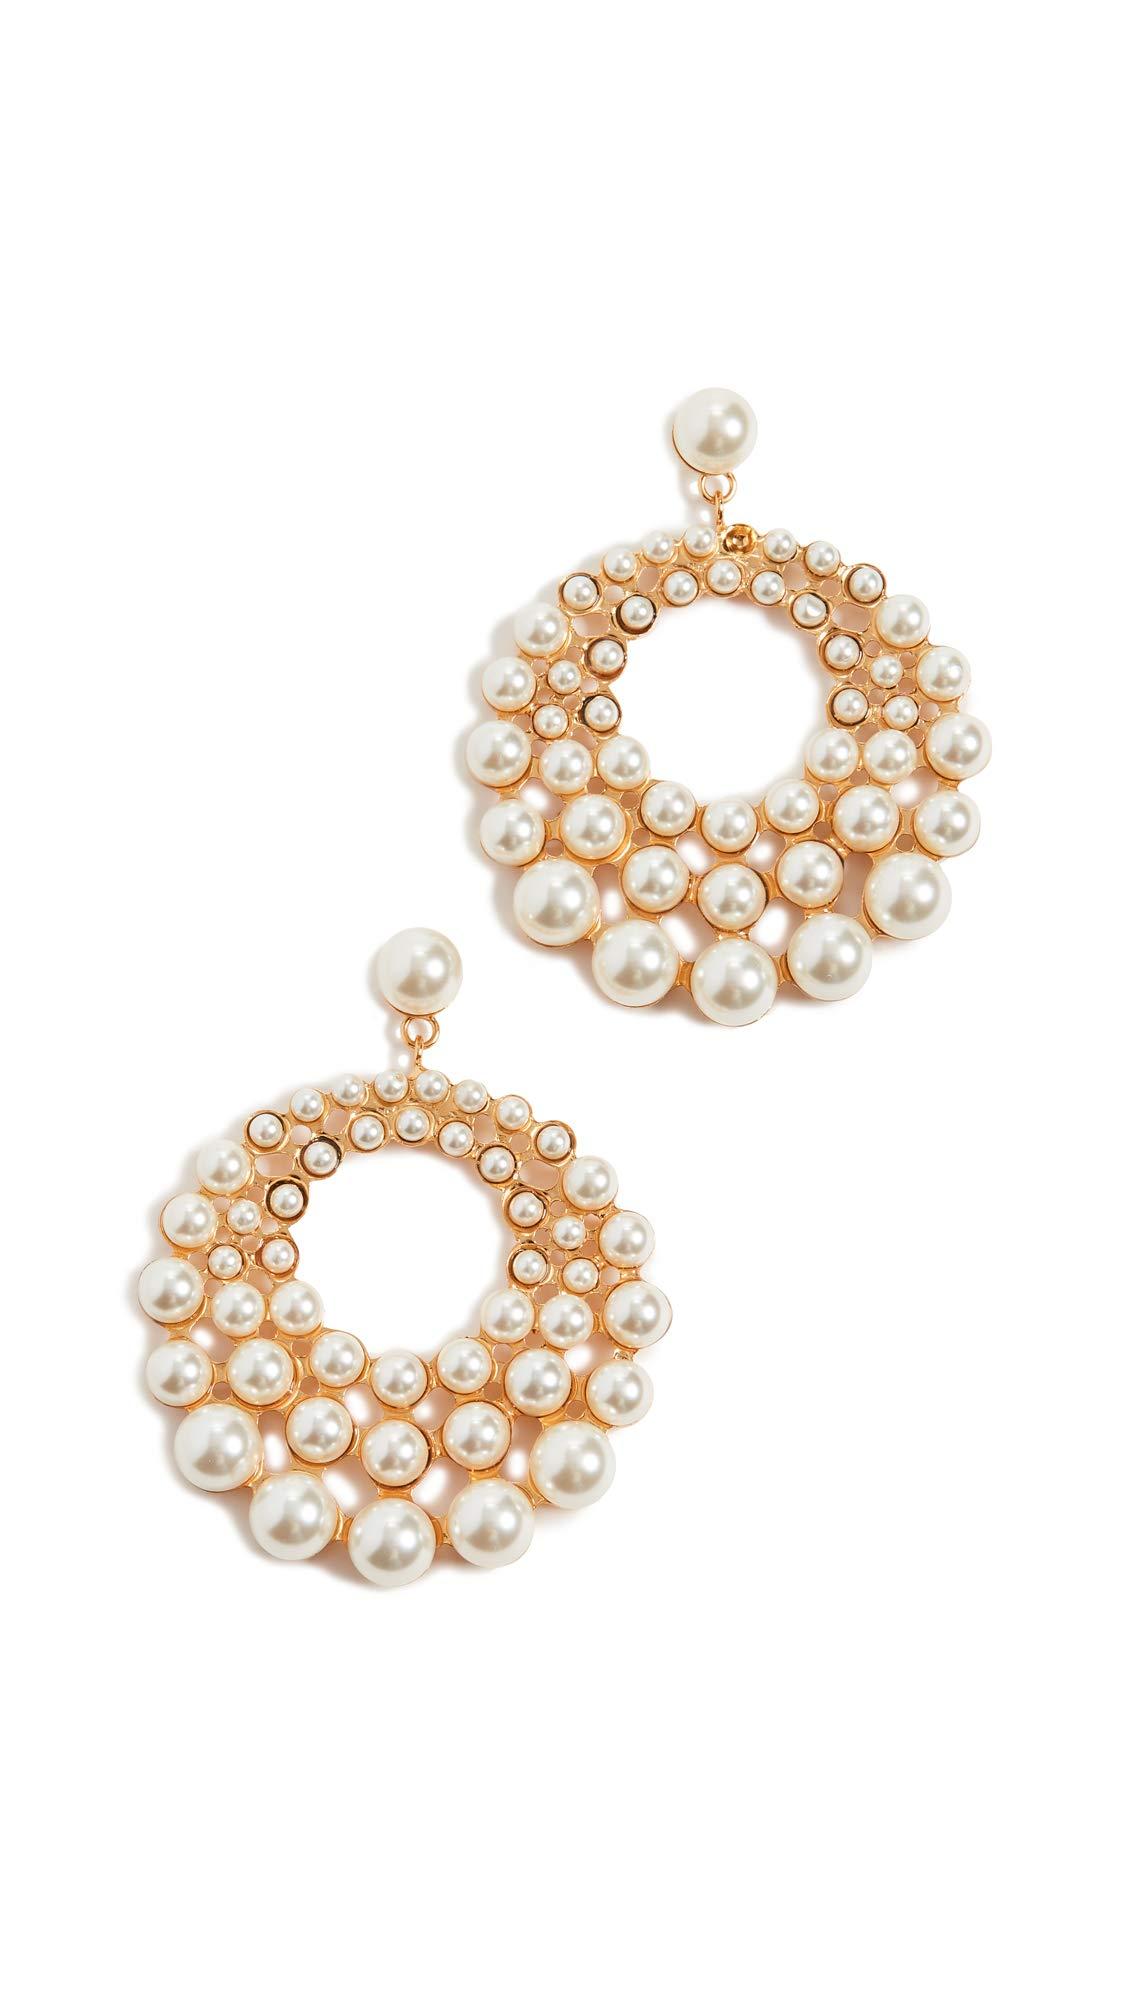 Jennifer Behr Women's Prianna Earrings, Pearl, Off White, Gold, One Size